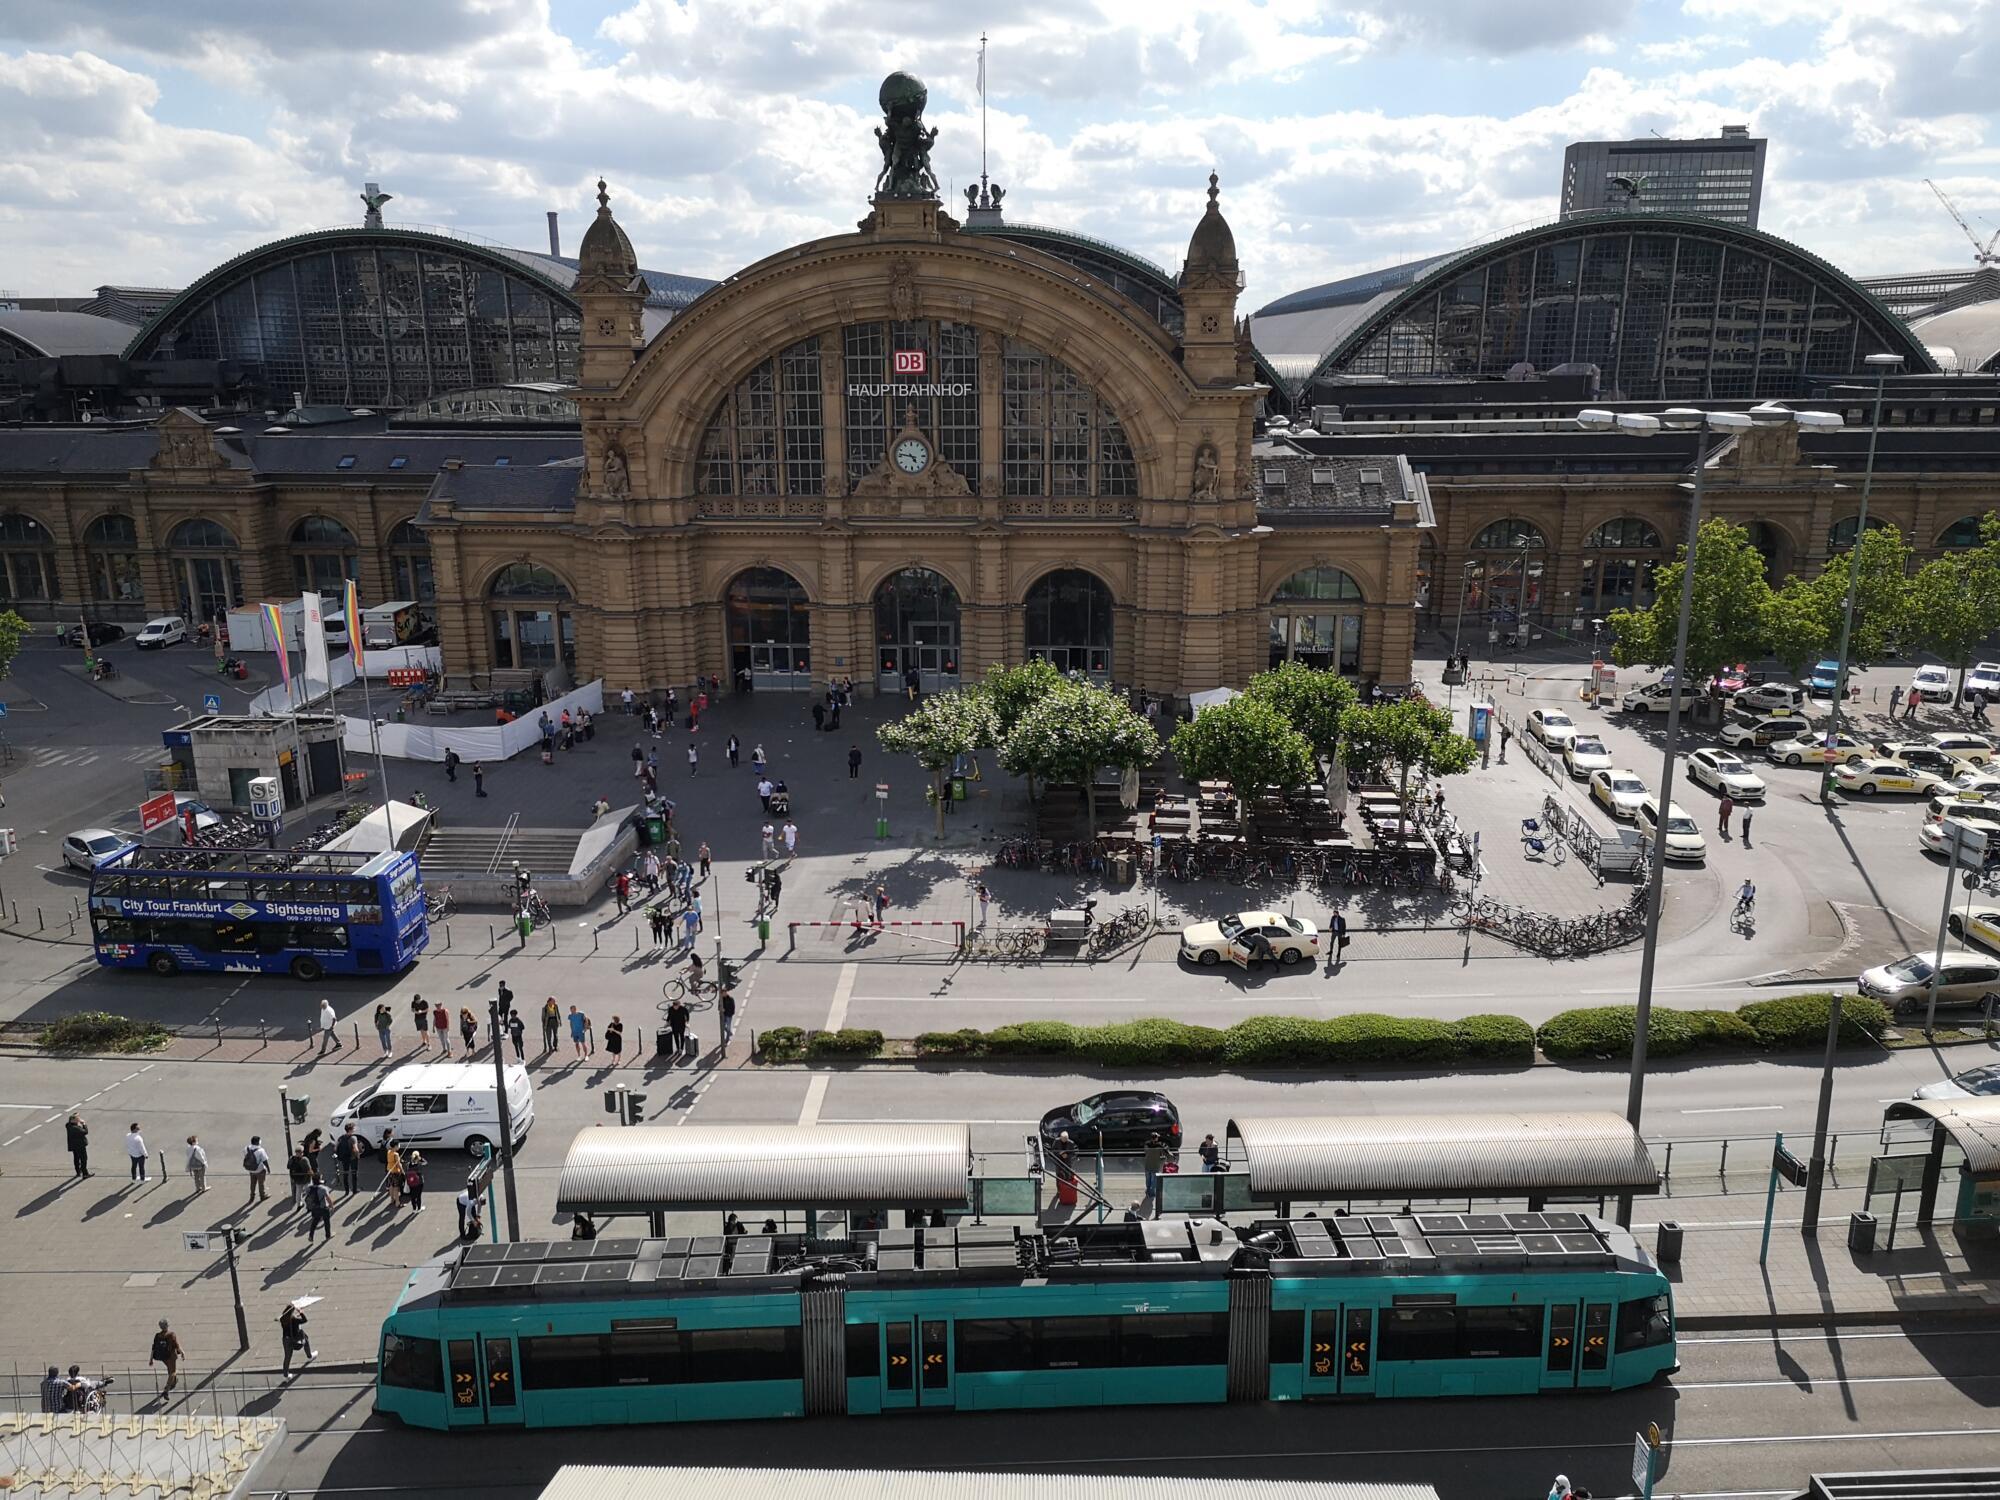 FrankfurtRheinMain Region